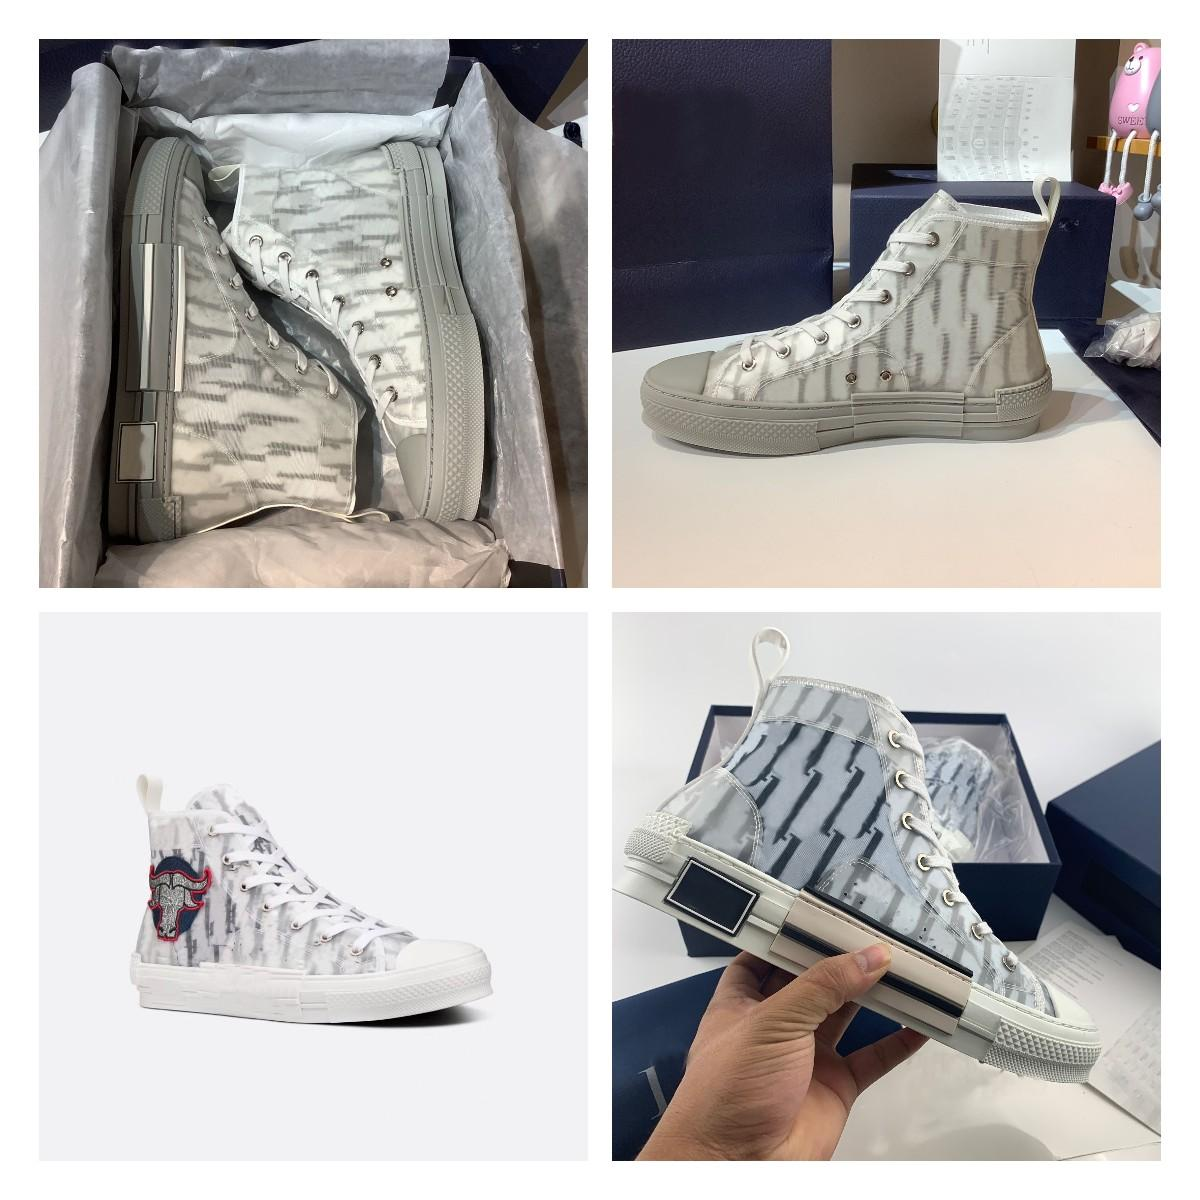 designer luxury sports shoes high quality leather oblique men's canvas shoes 19 lace up platform black and white blue SS women's shoes